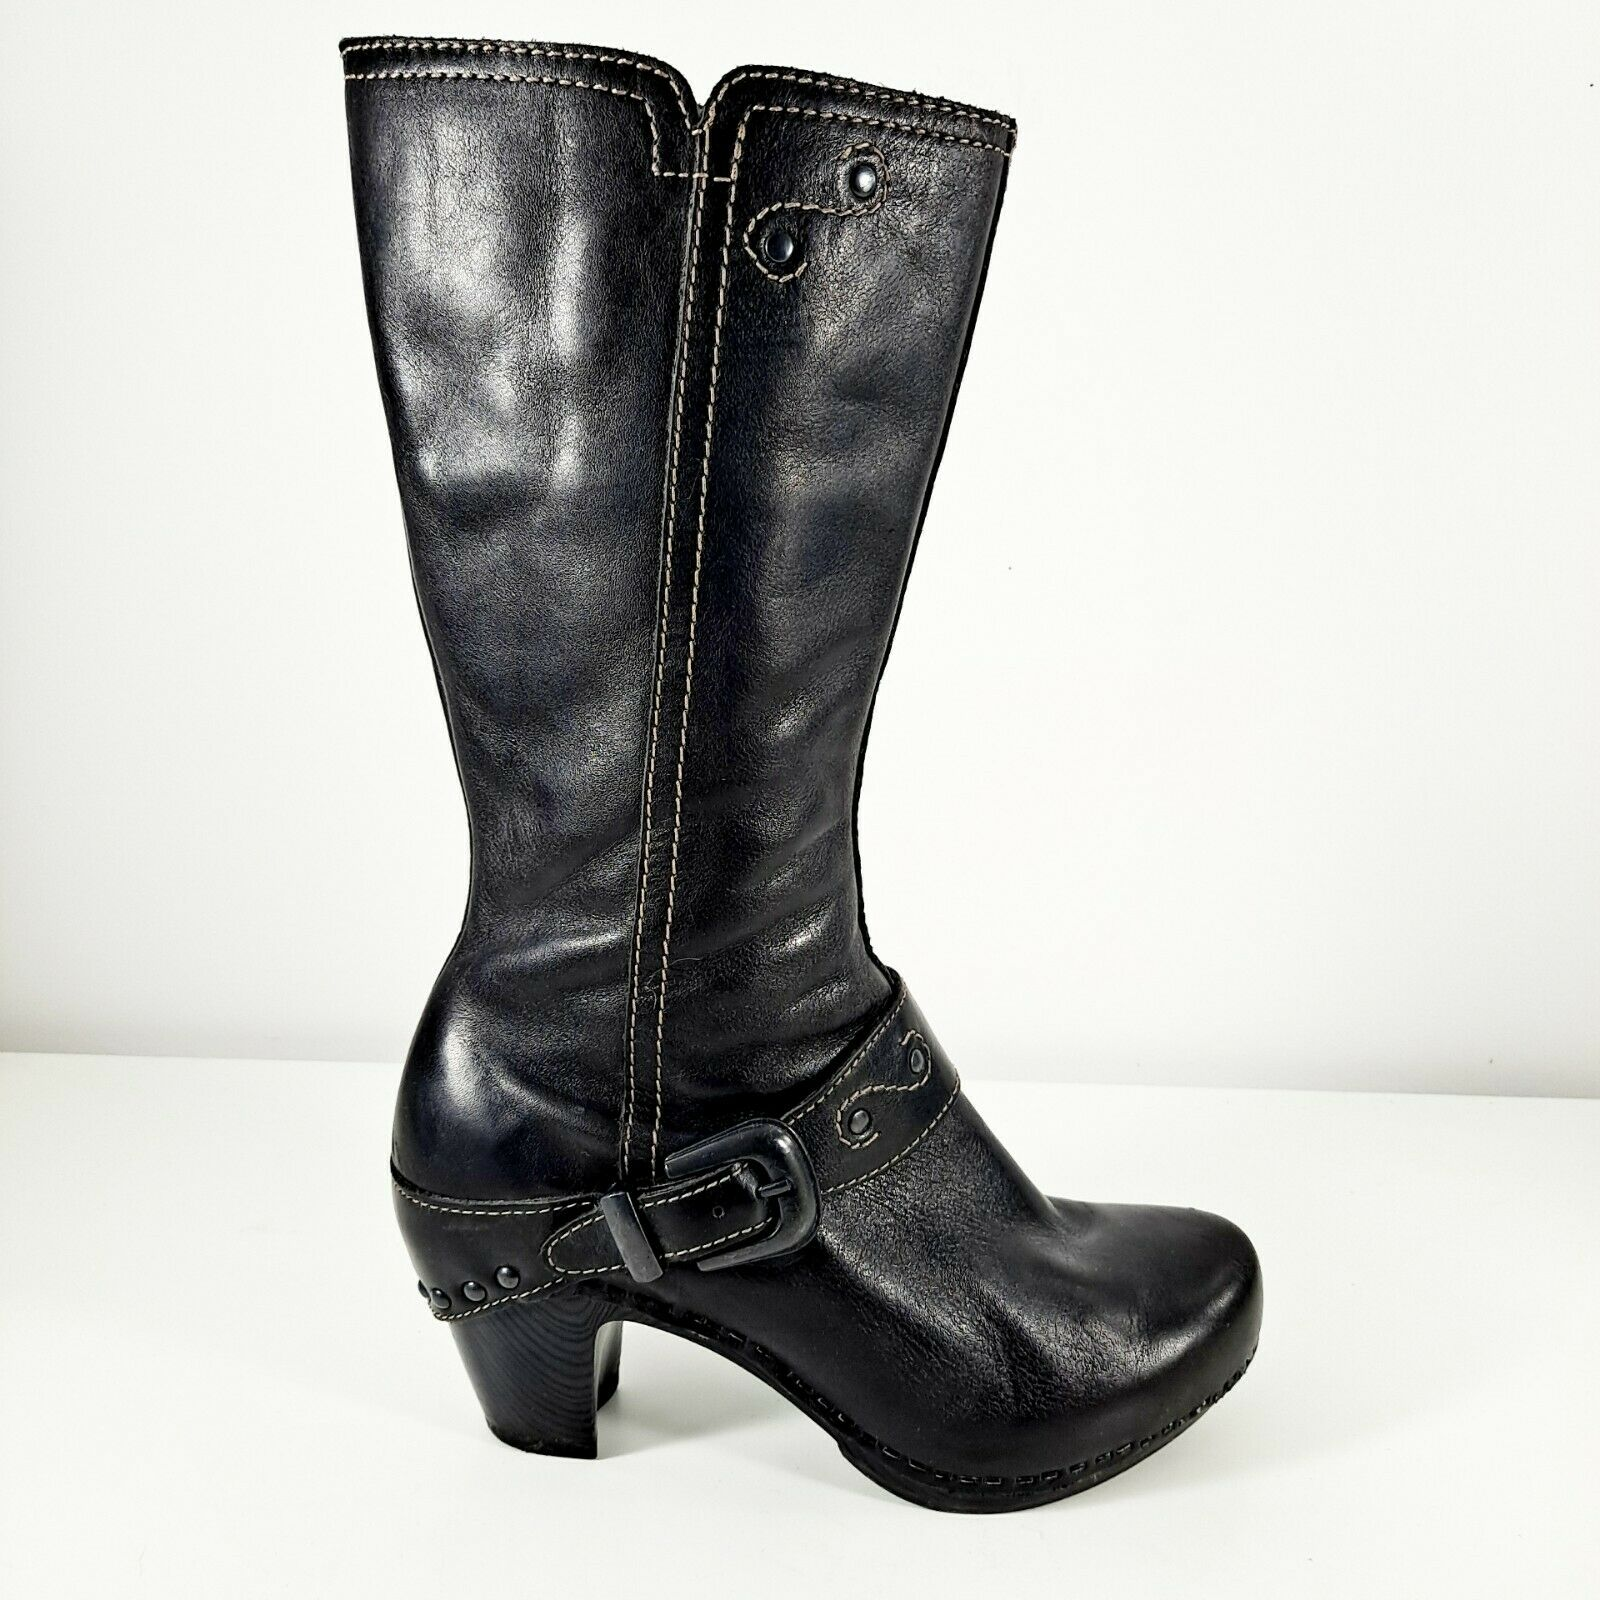 Dansko Womens Boots Sz 36 EU 6 US Black Leather Mid Calf Block Heels